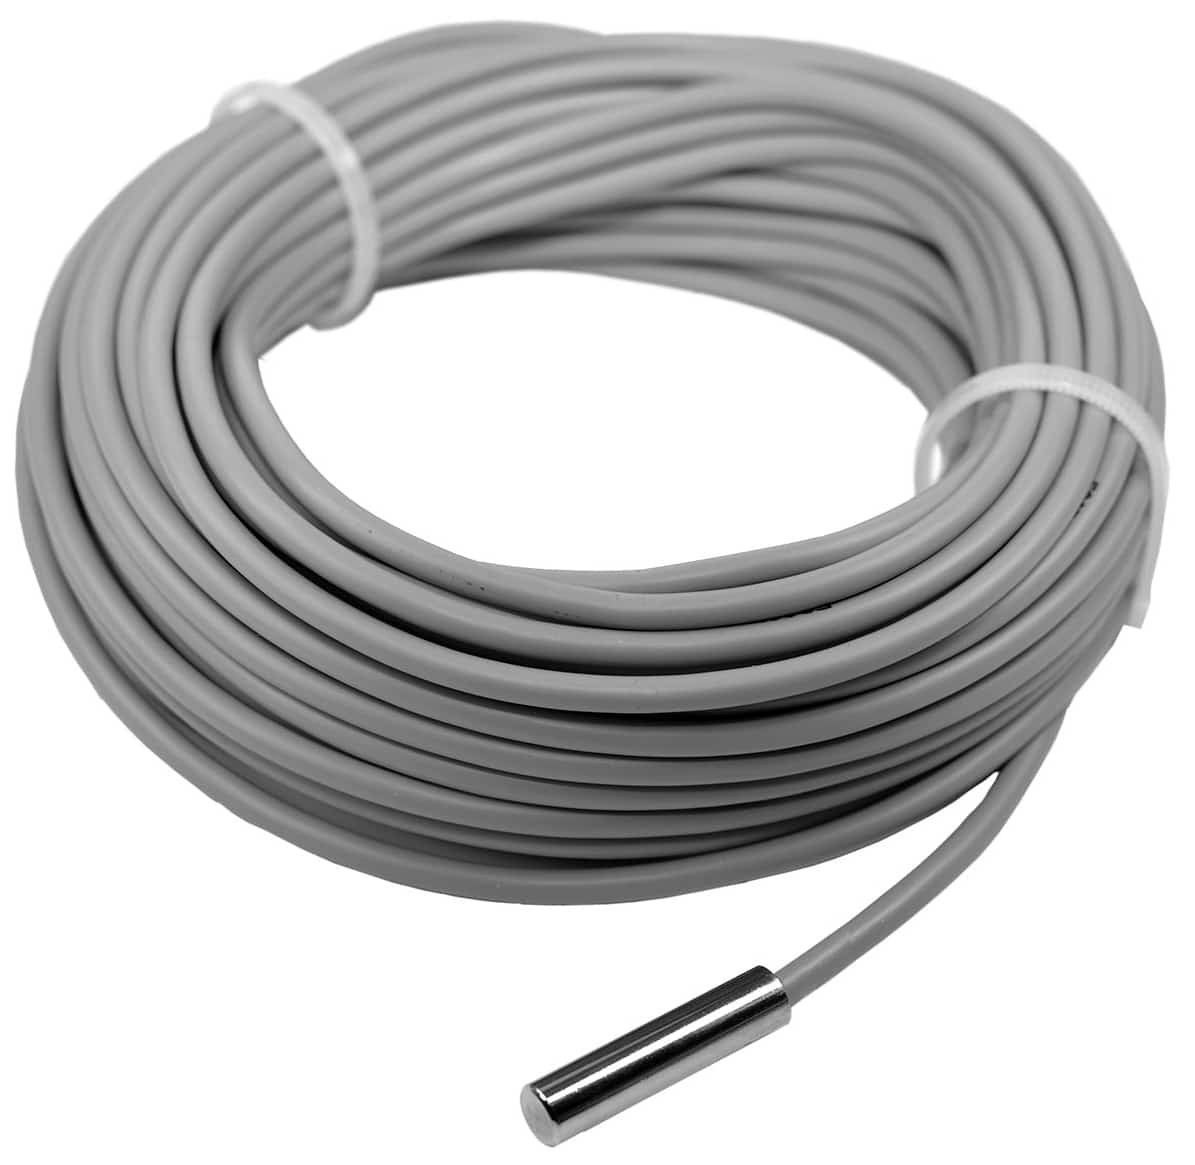 1-Wire waterproof temperature sensor